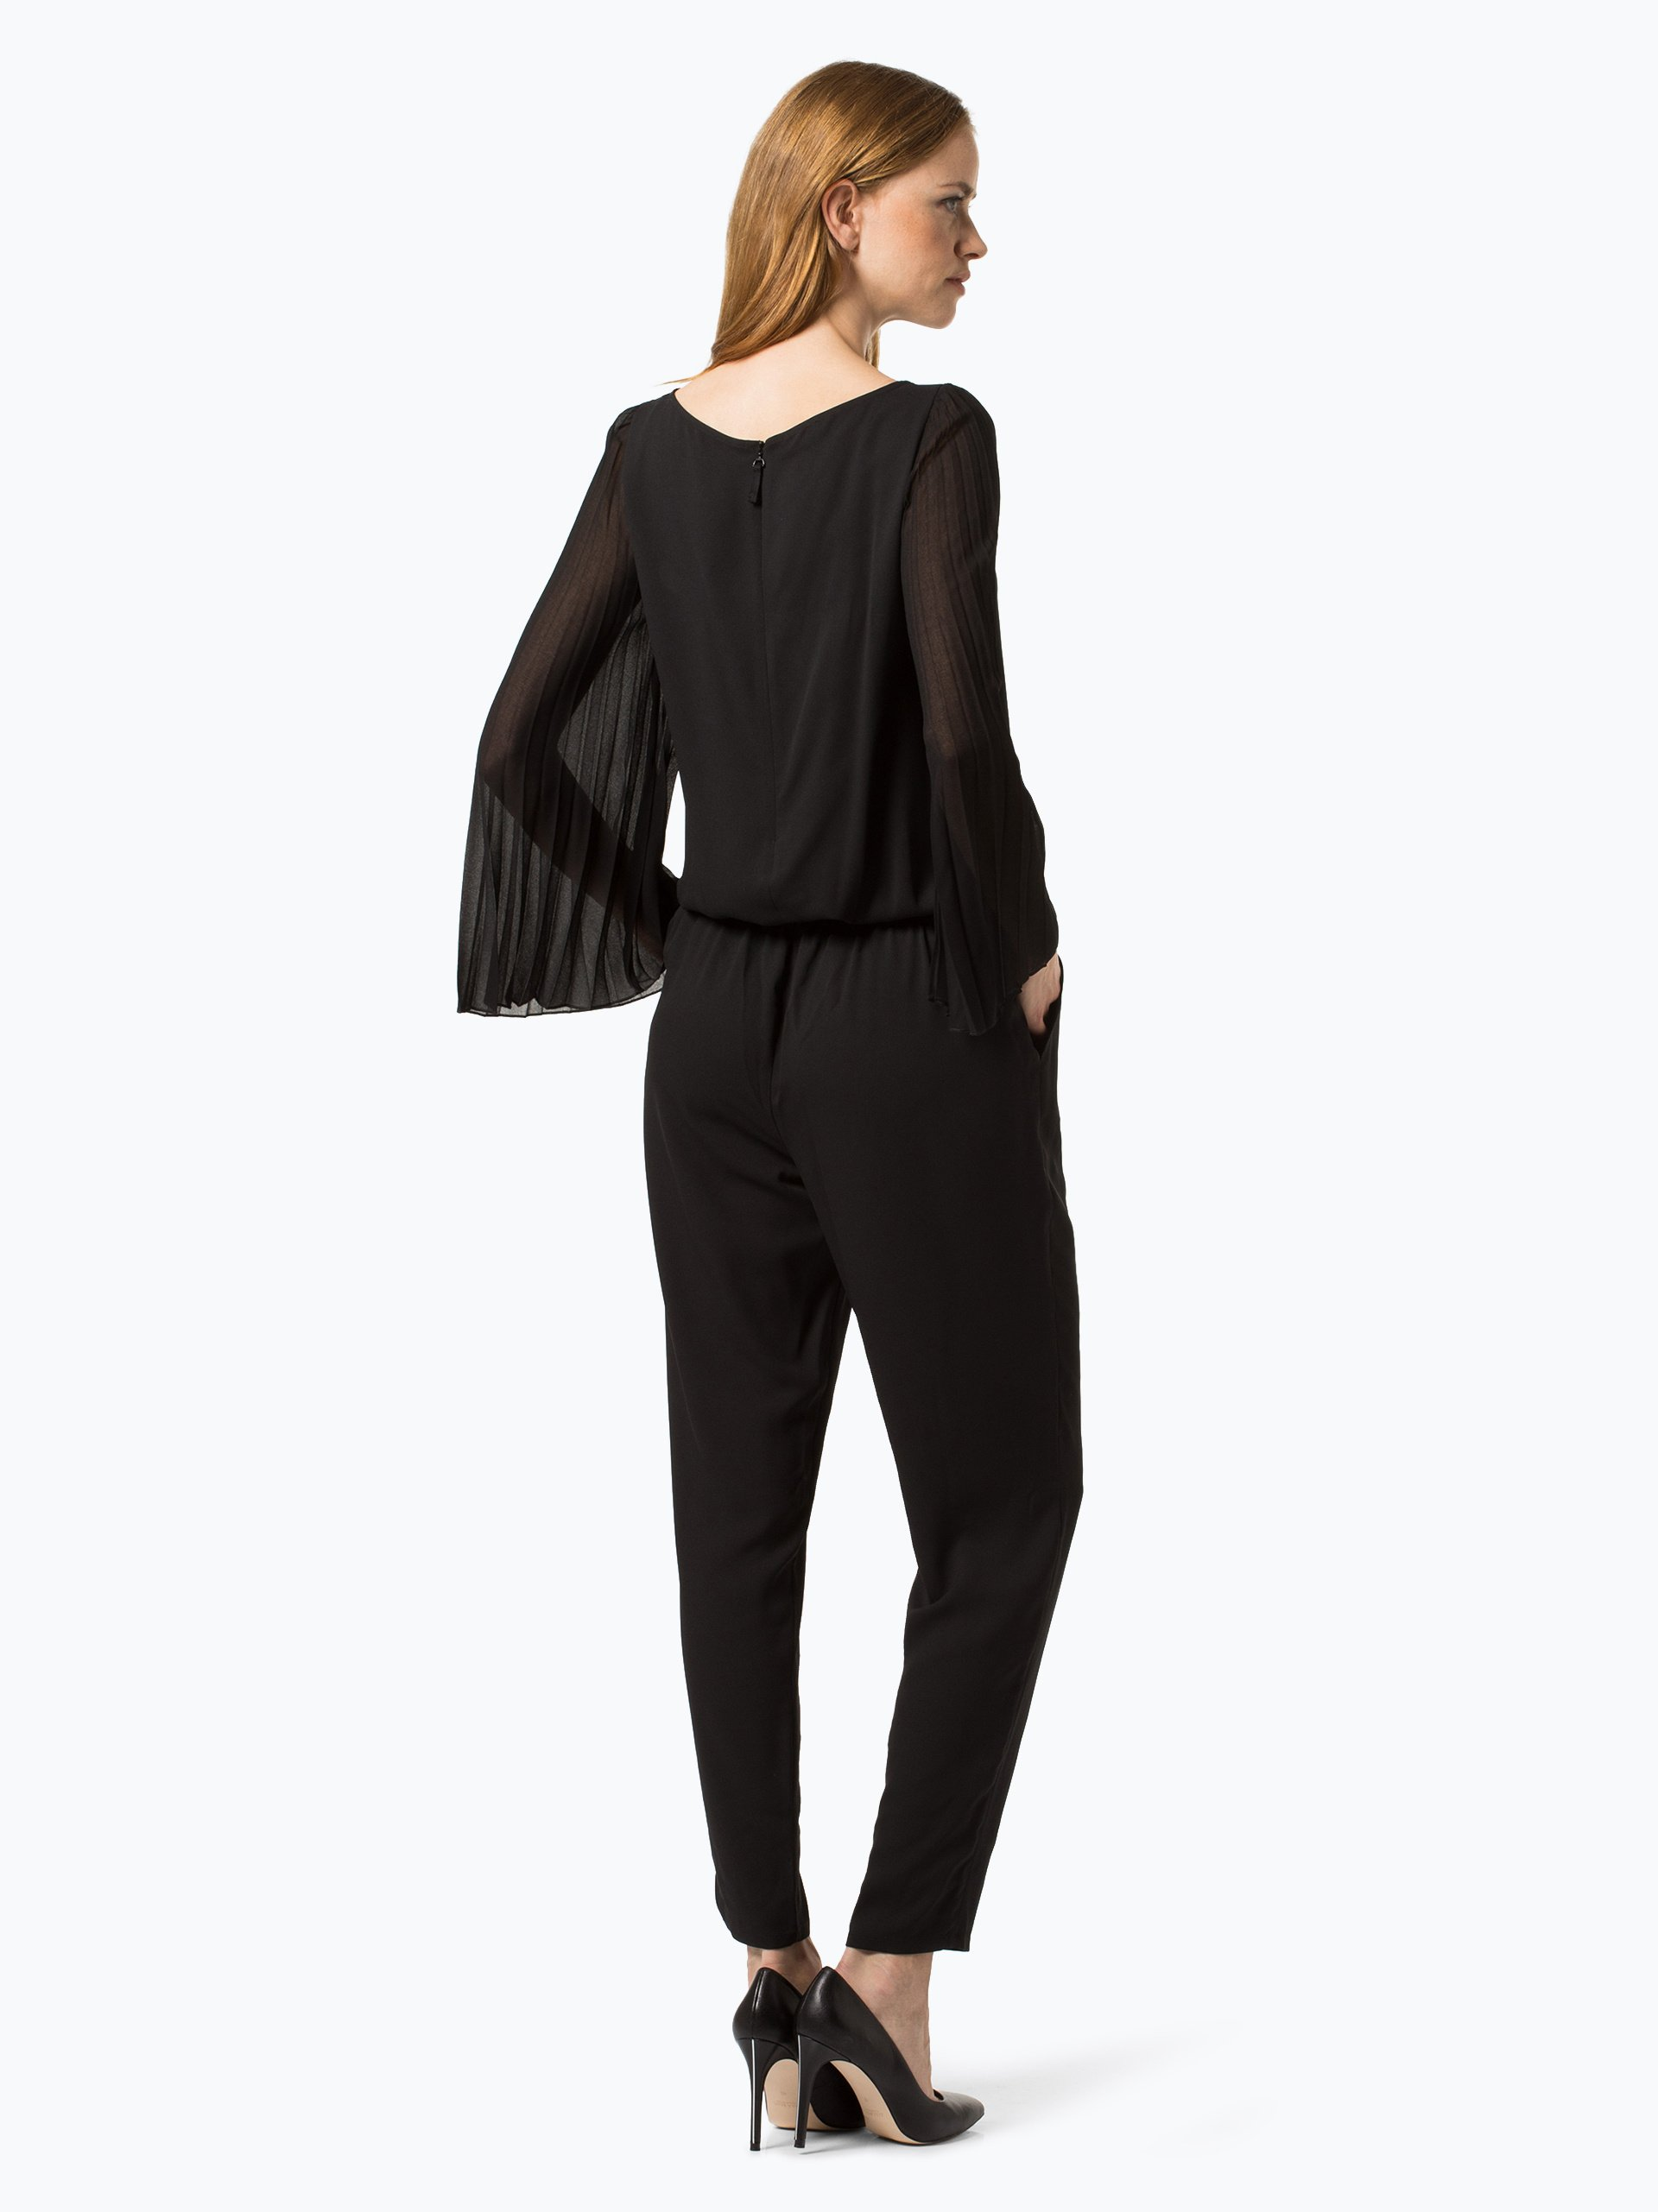 taifun damen jumpsuit schwarz uni online kaufen vangraaf com. Black Bedroom Furniture Sets. Home Design Ideas